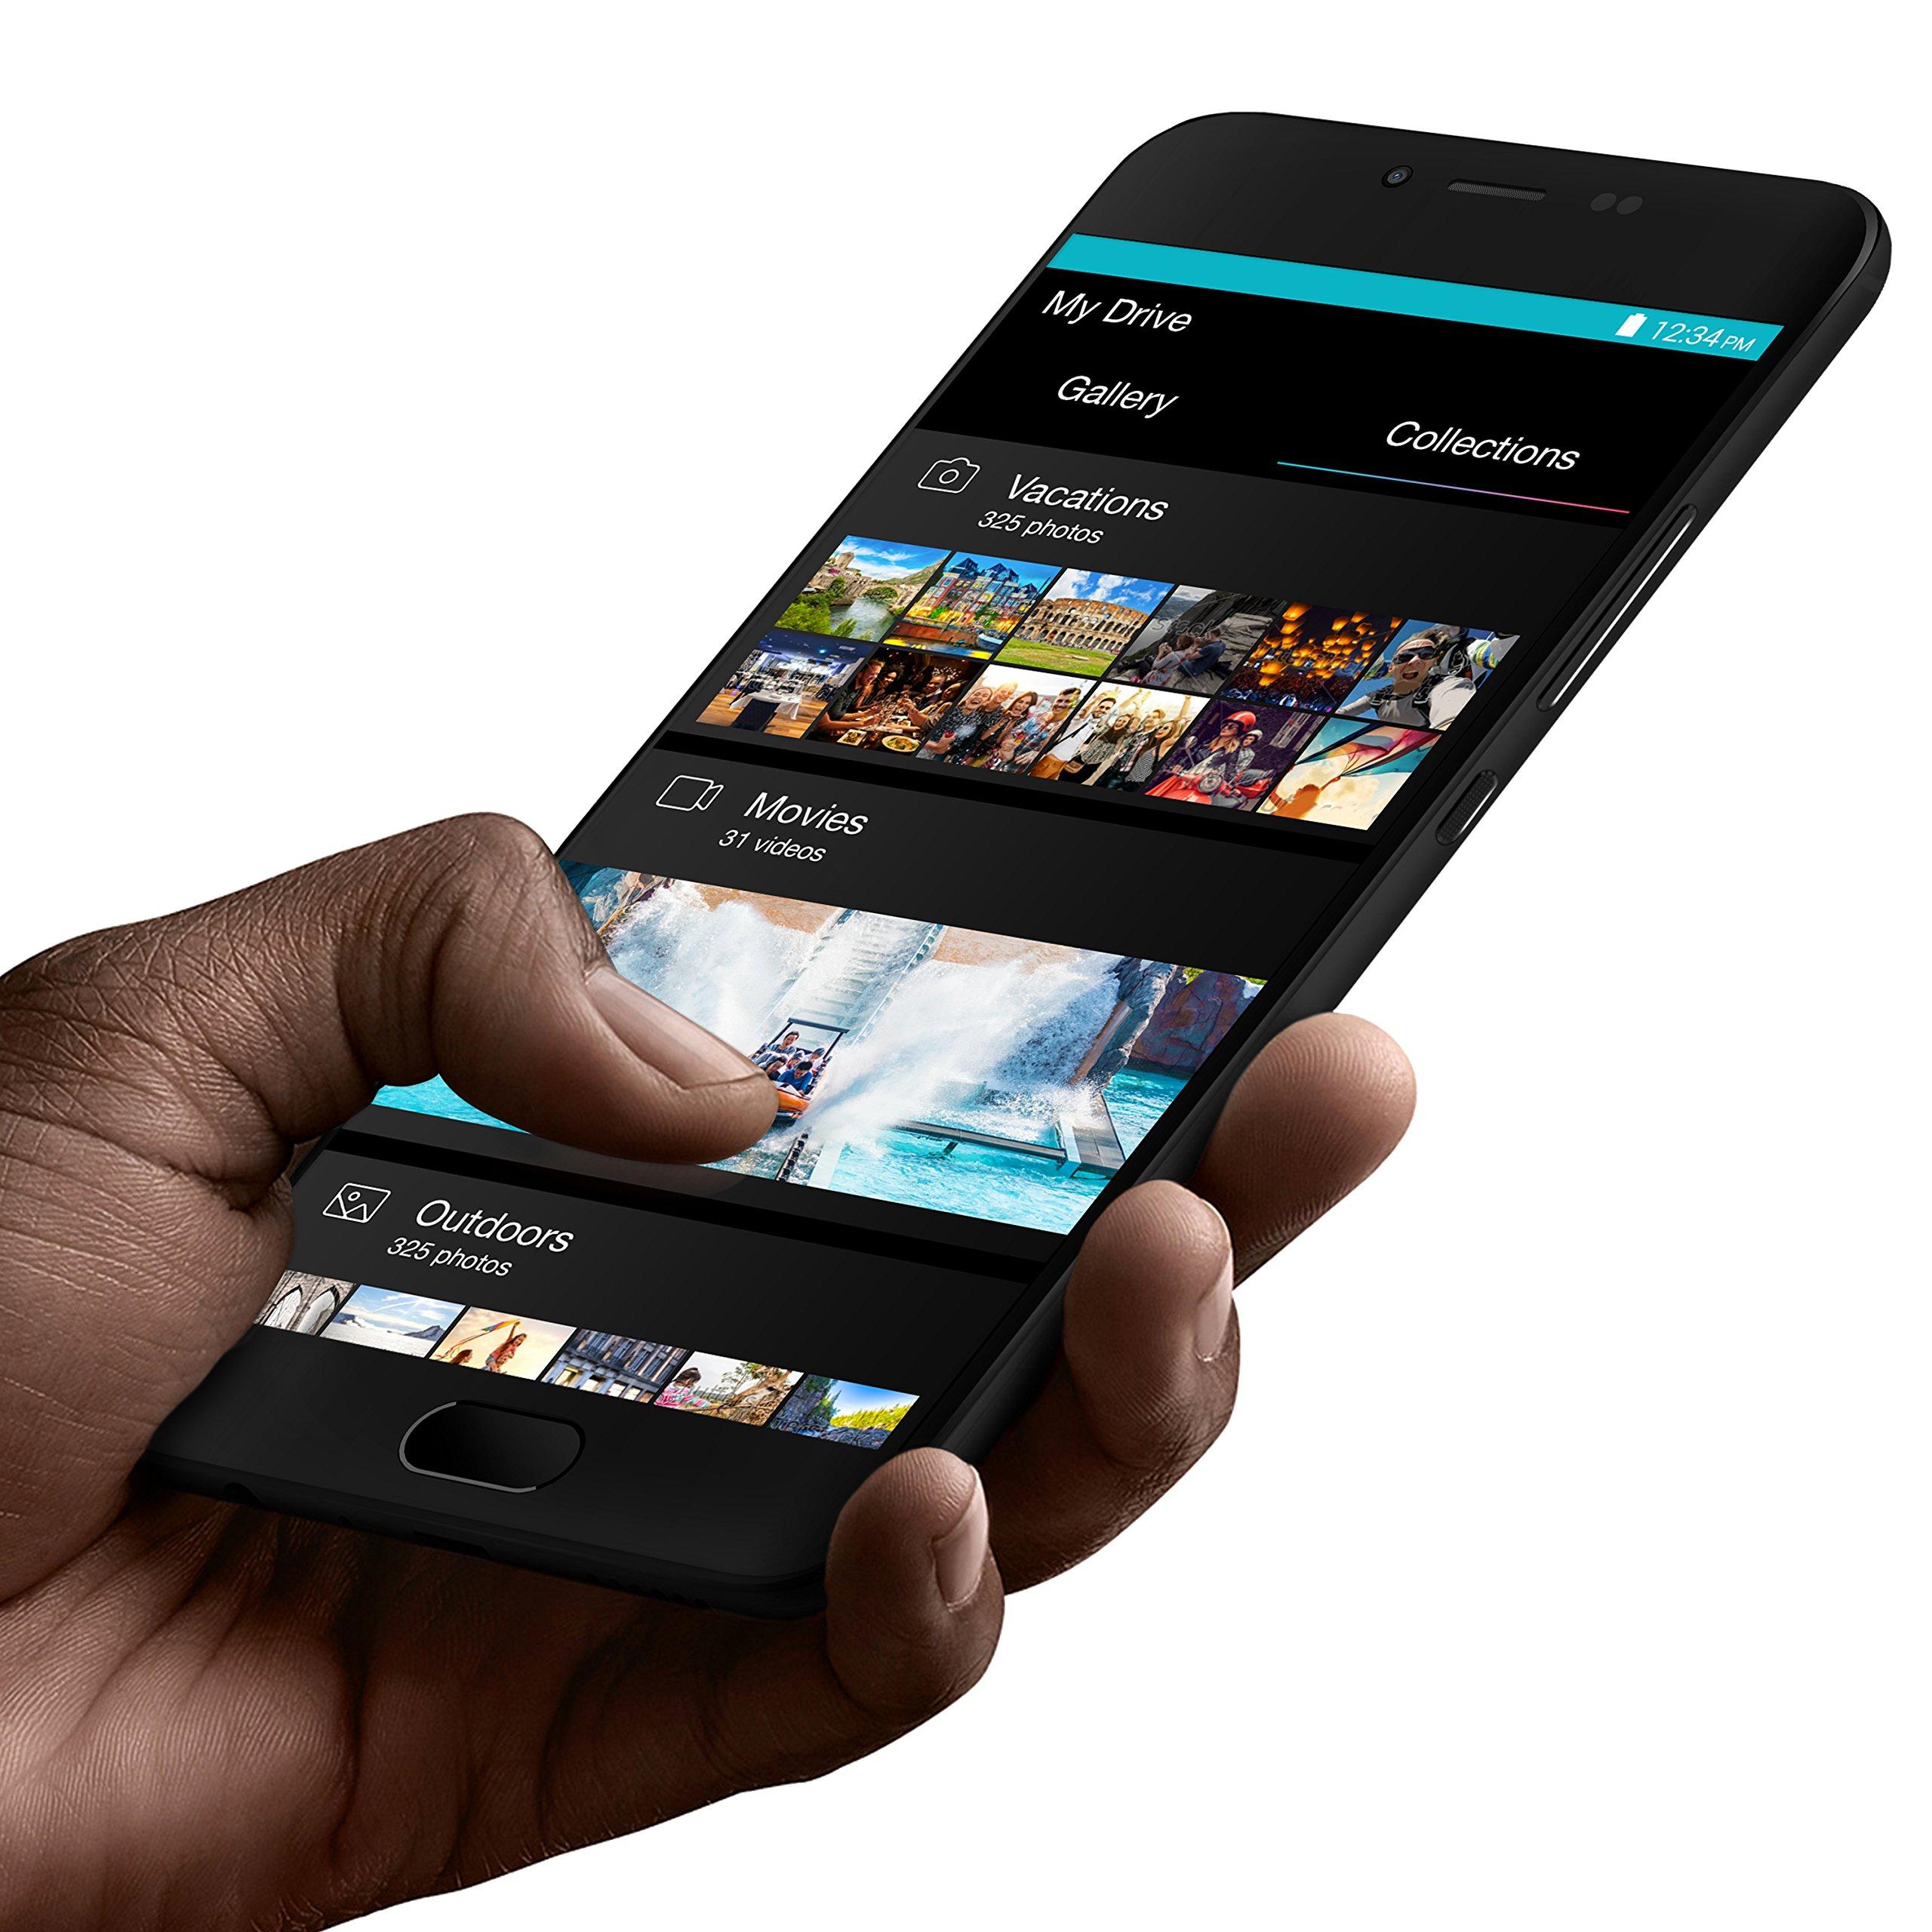 BLU R1 HD 2018 Factory Unlocked Phone - 5.2'' - 16GB - Black (U.S. Warranty) by BLU (Image #2)